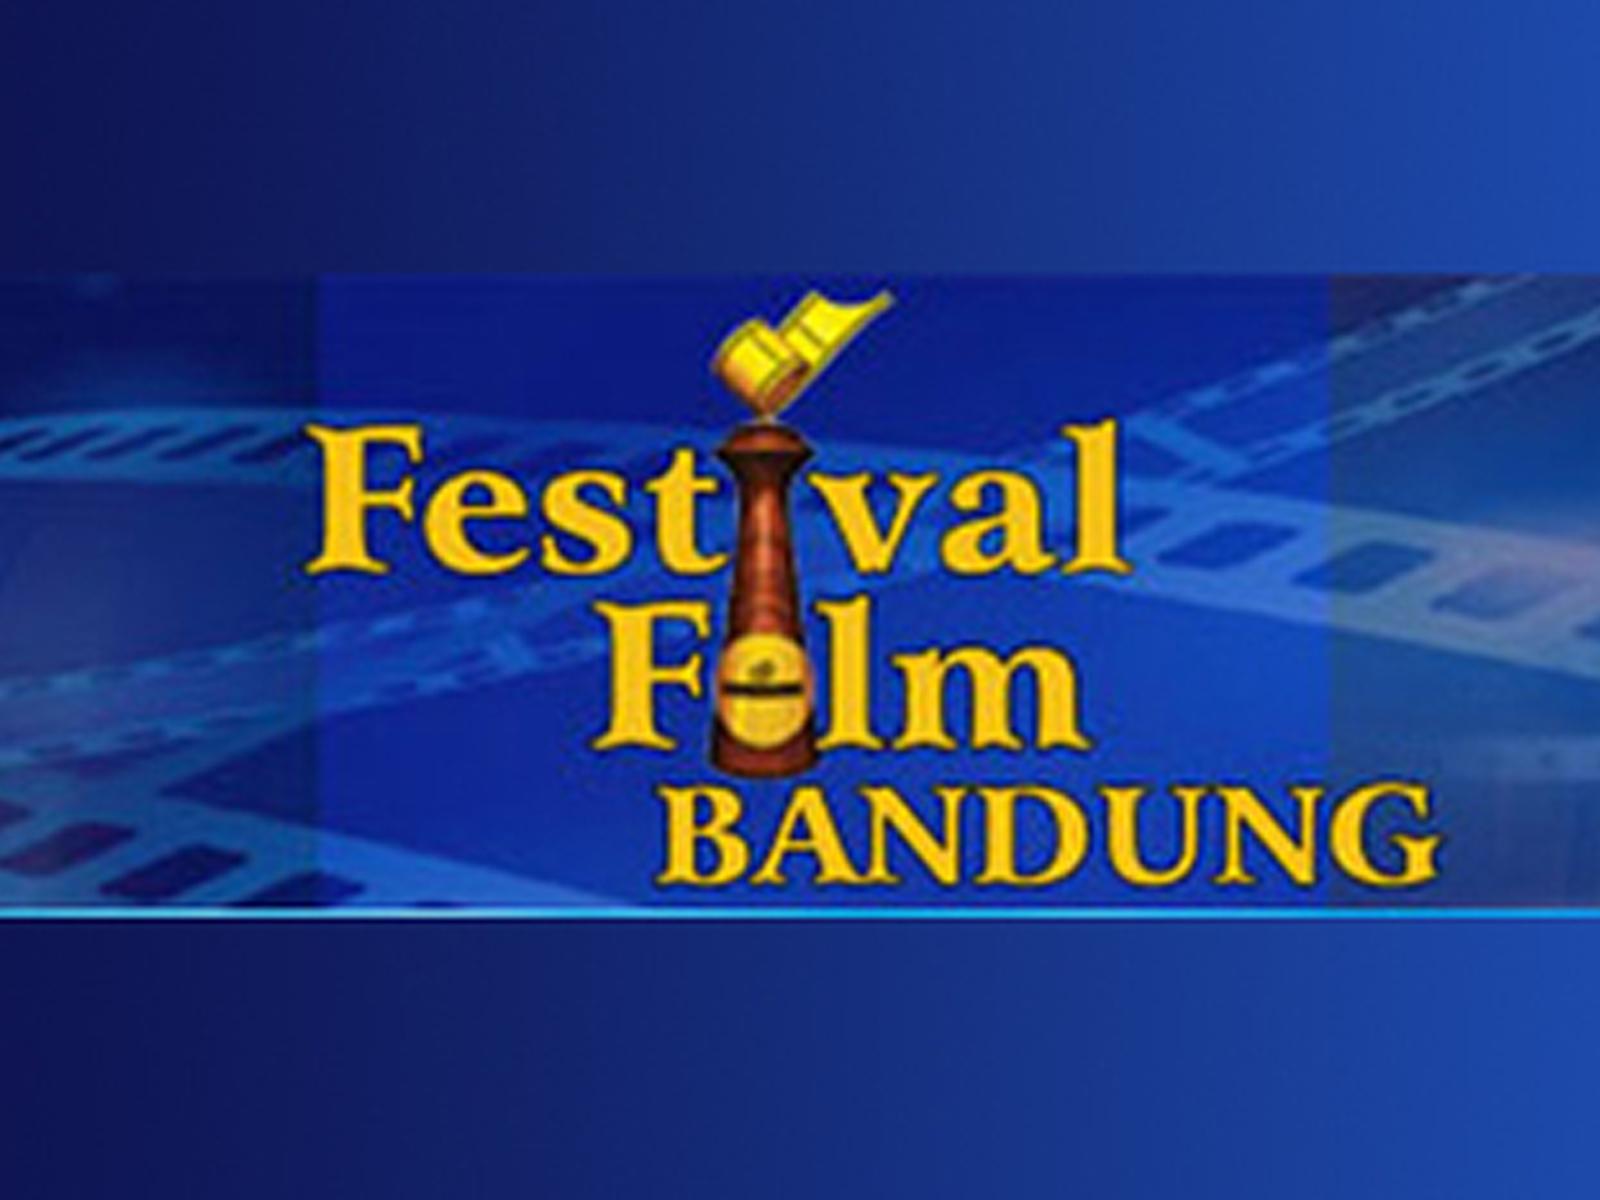 Festival Film Bandung 2016